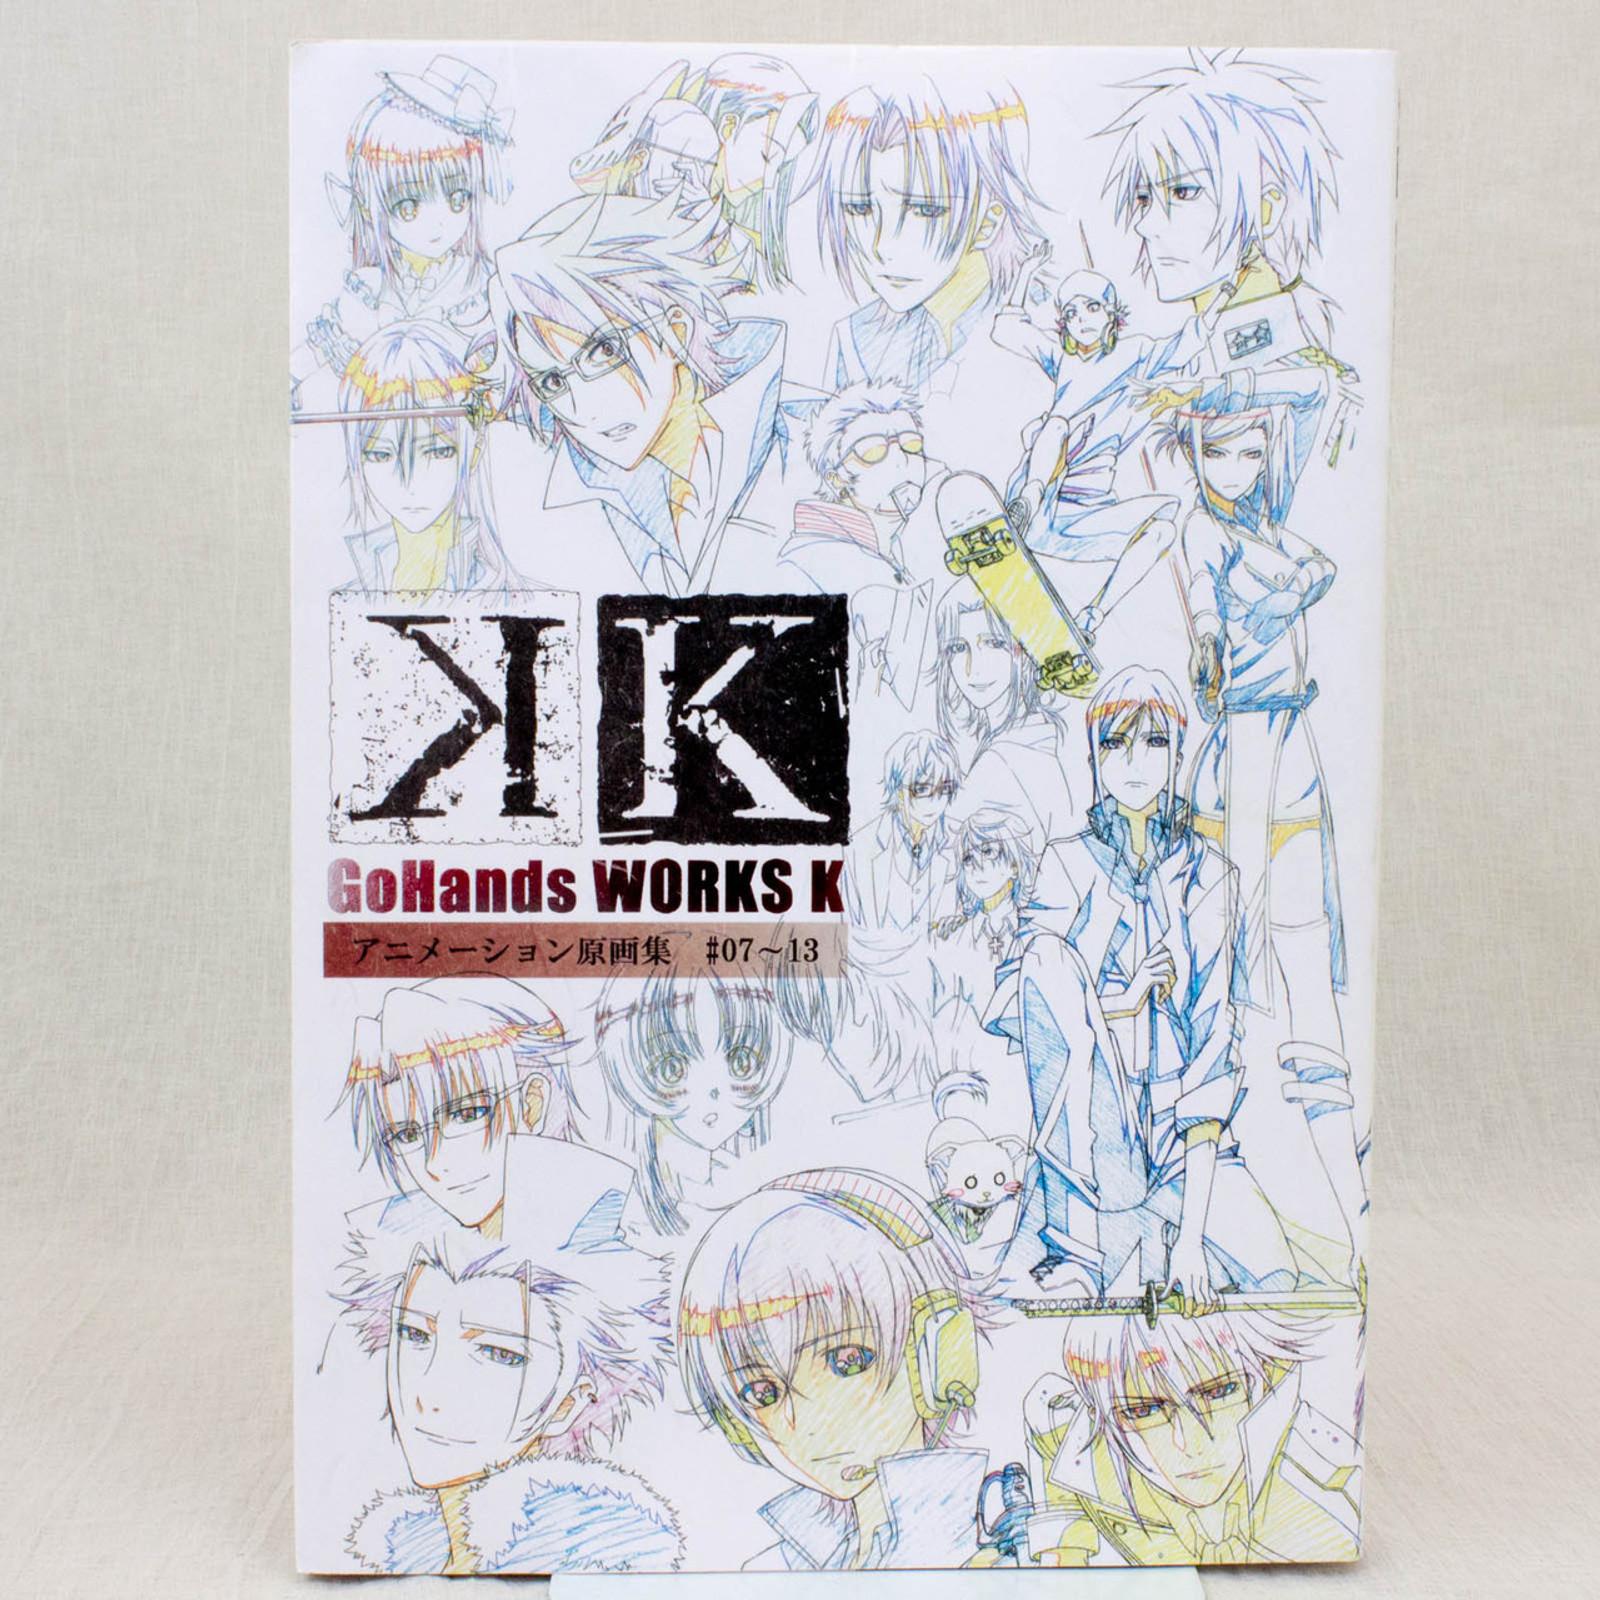 GoHands WORKS K Project Original Sketches Art Book #07-13 JAPAN ANIME MANGA